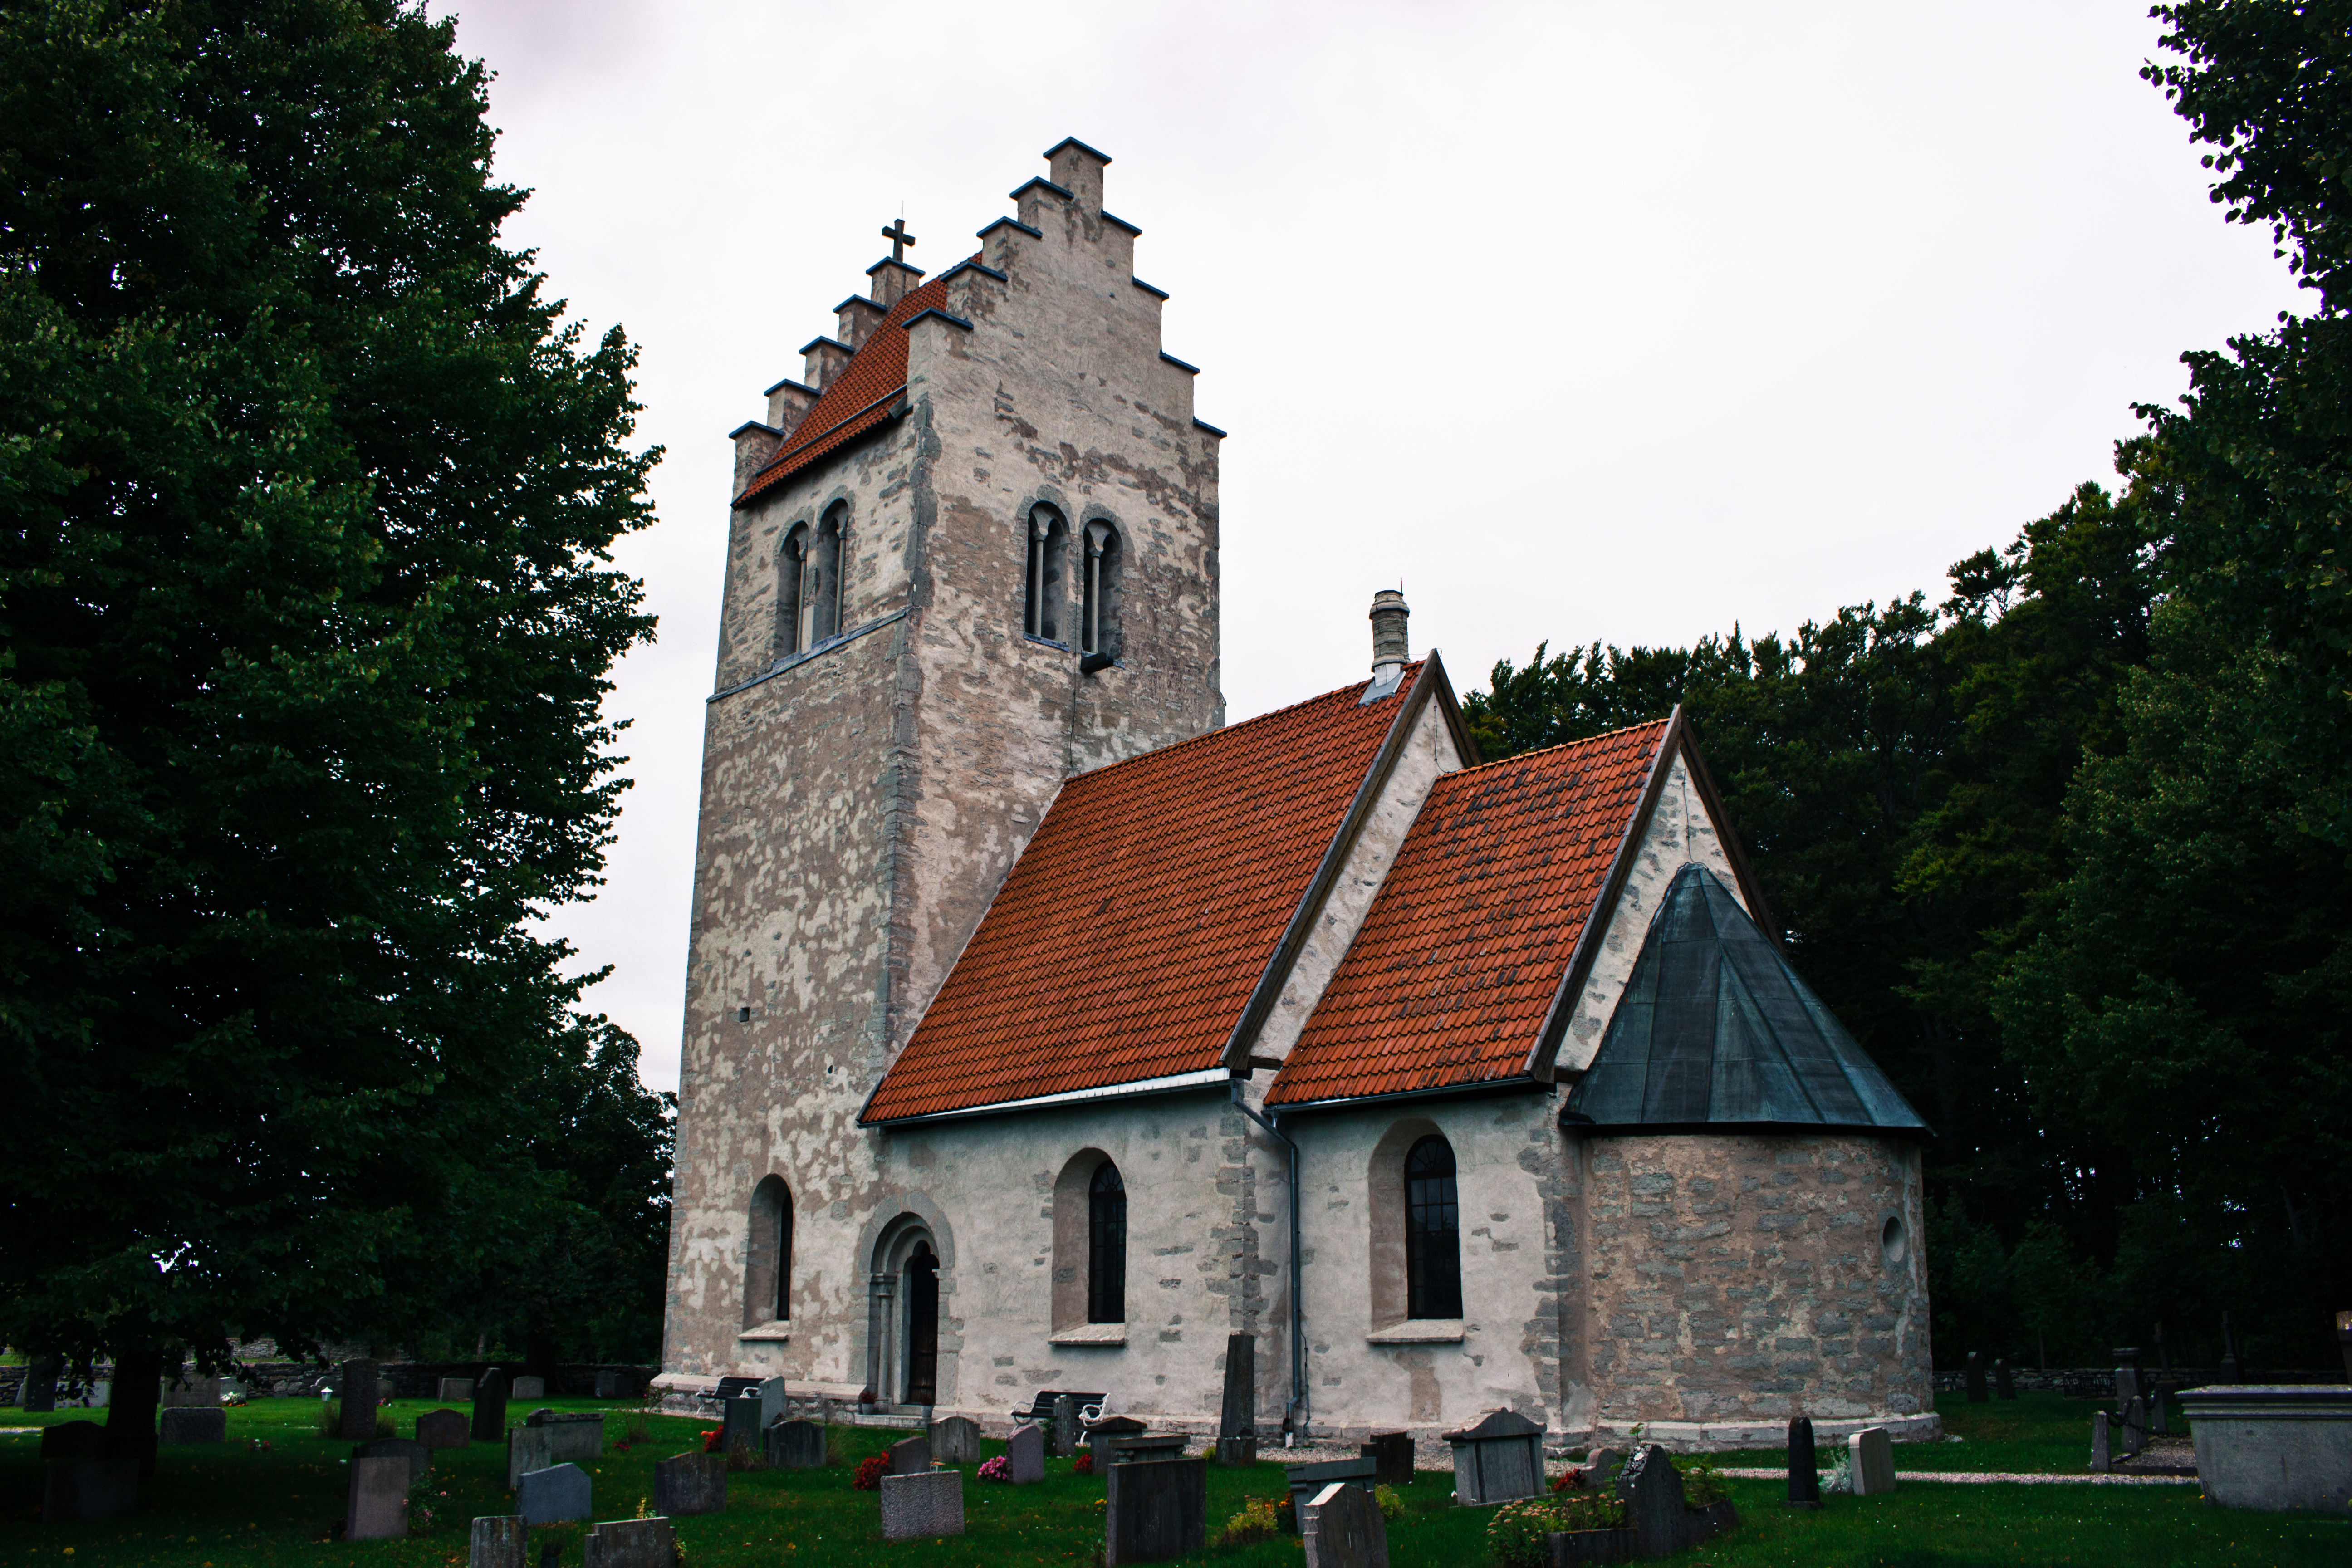 Stenstugu 1:38 satisfaction-survey.net, Vsterhejde Region Gotland